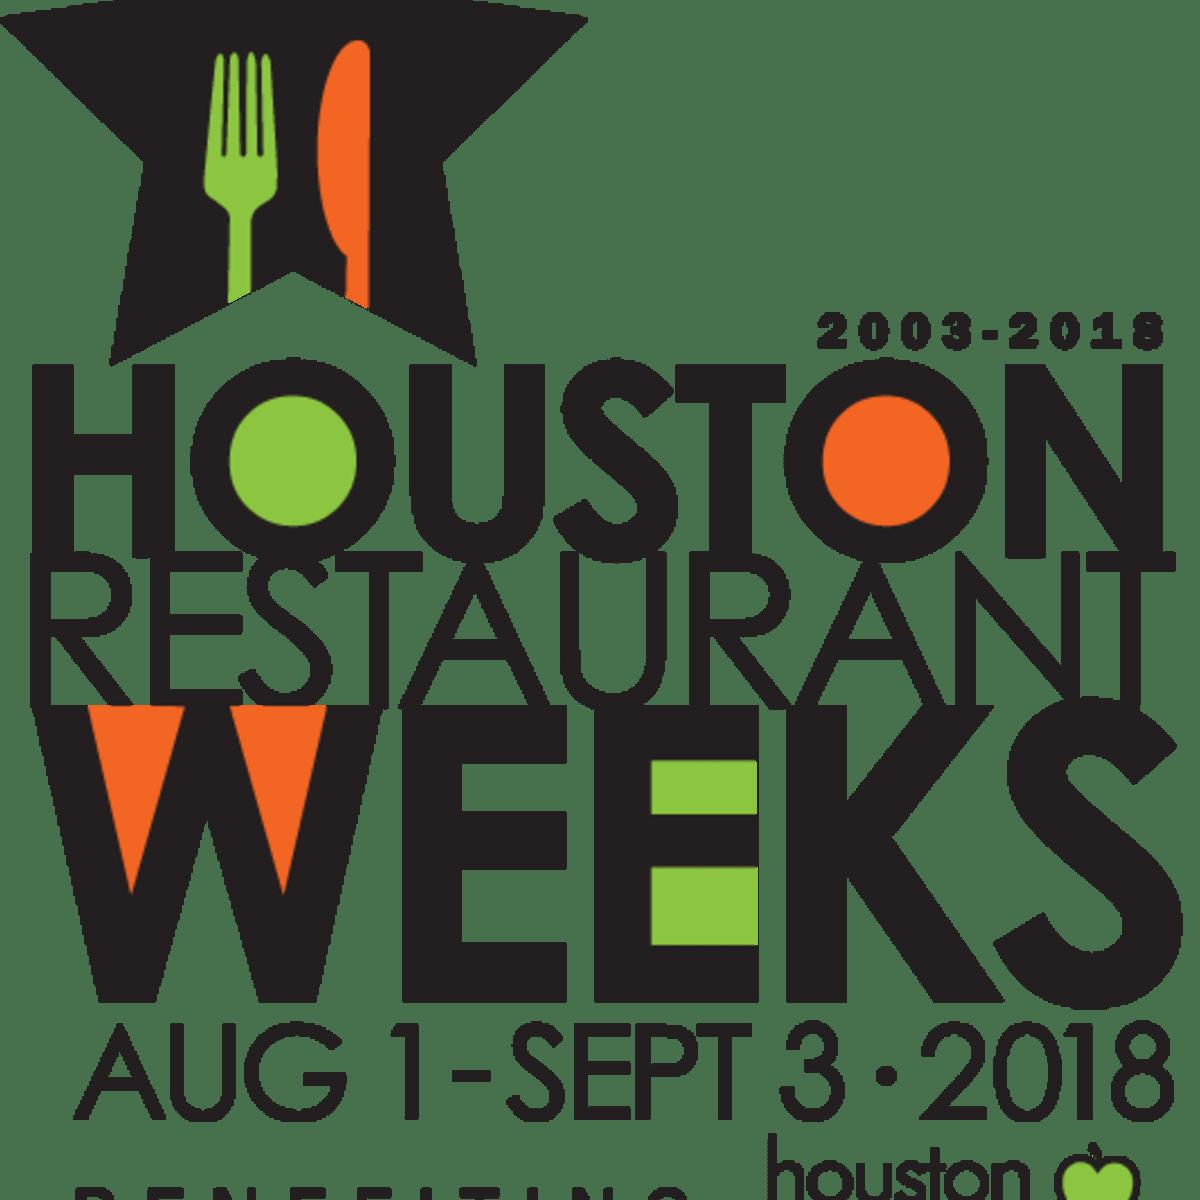 Houston Restaurant Weeks logo 2018